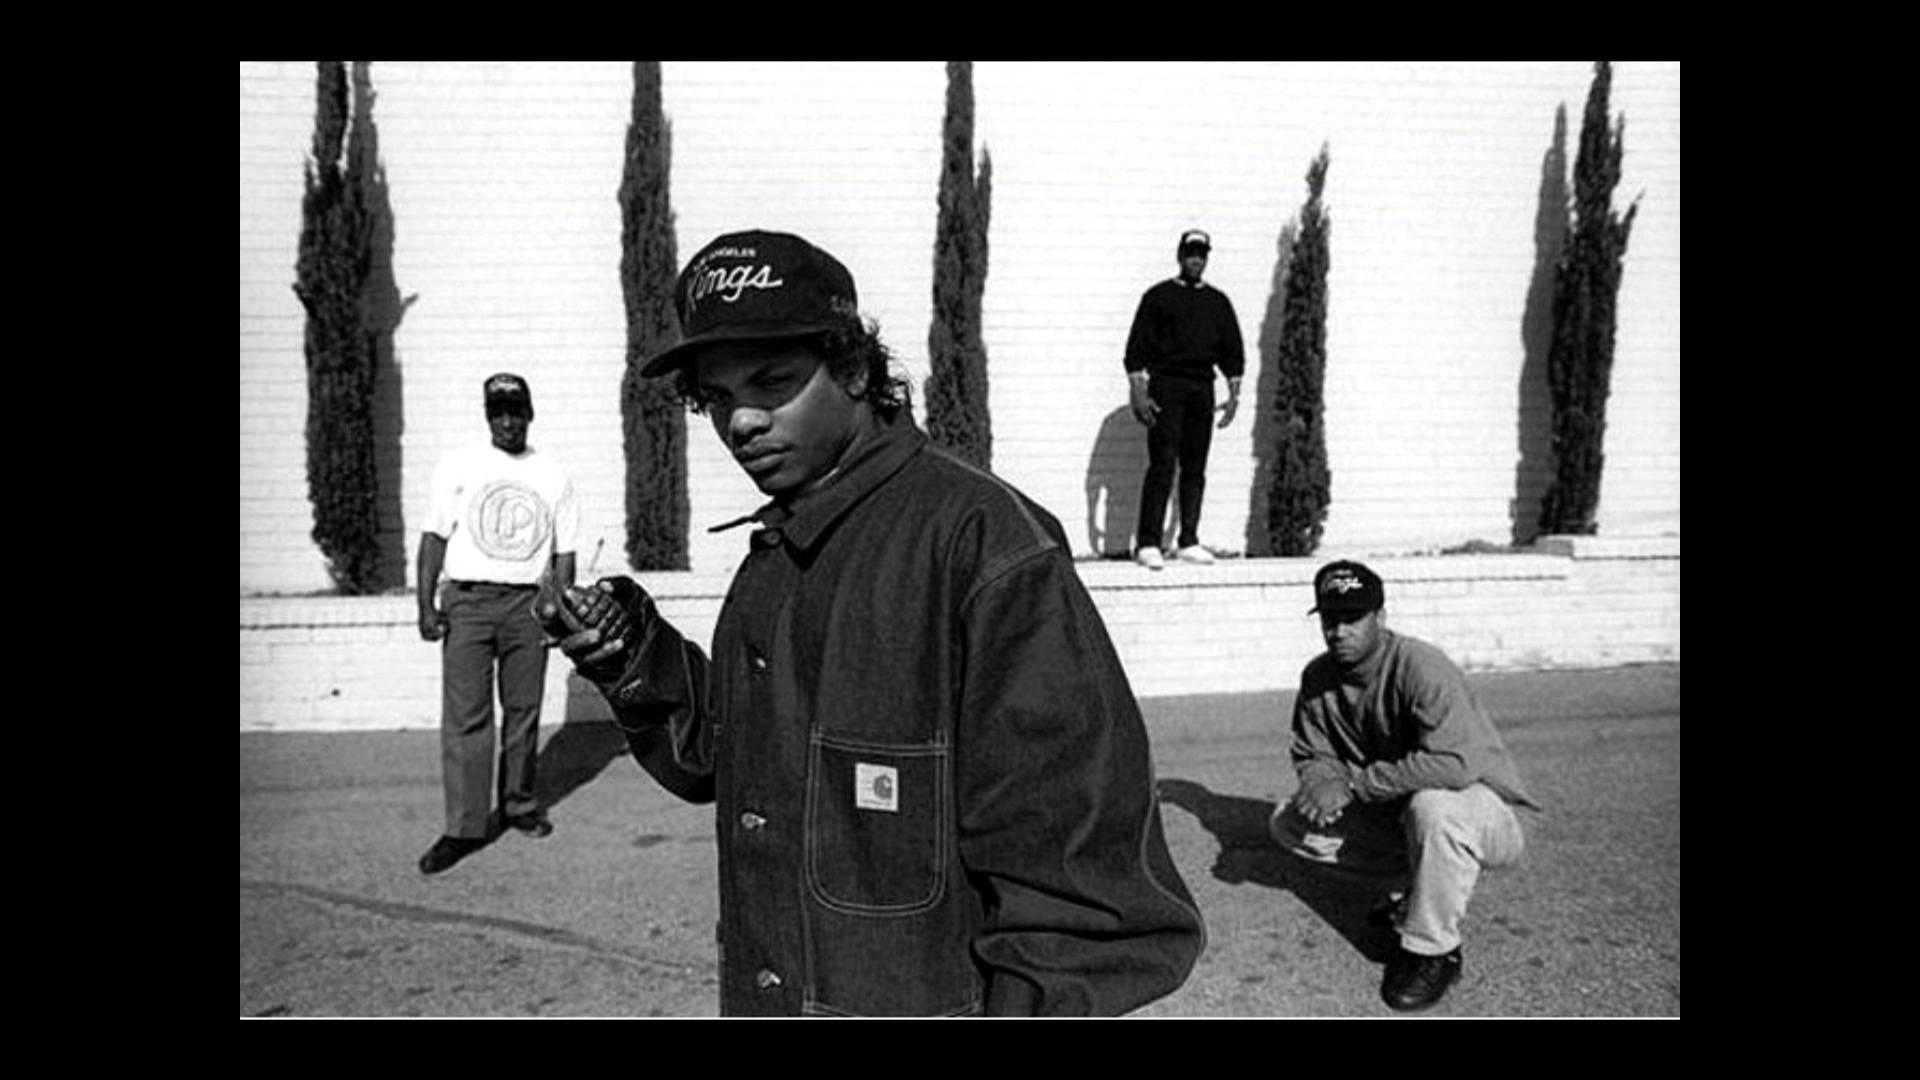 Eazy E nwa gangsta rapper rap hip hop eazy-e d wallpaper background